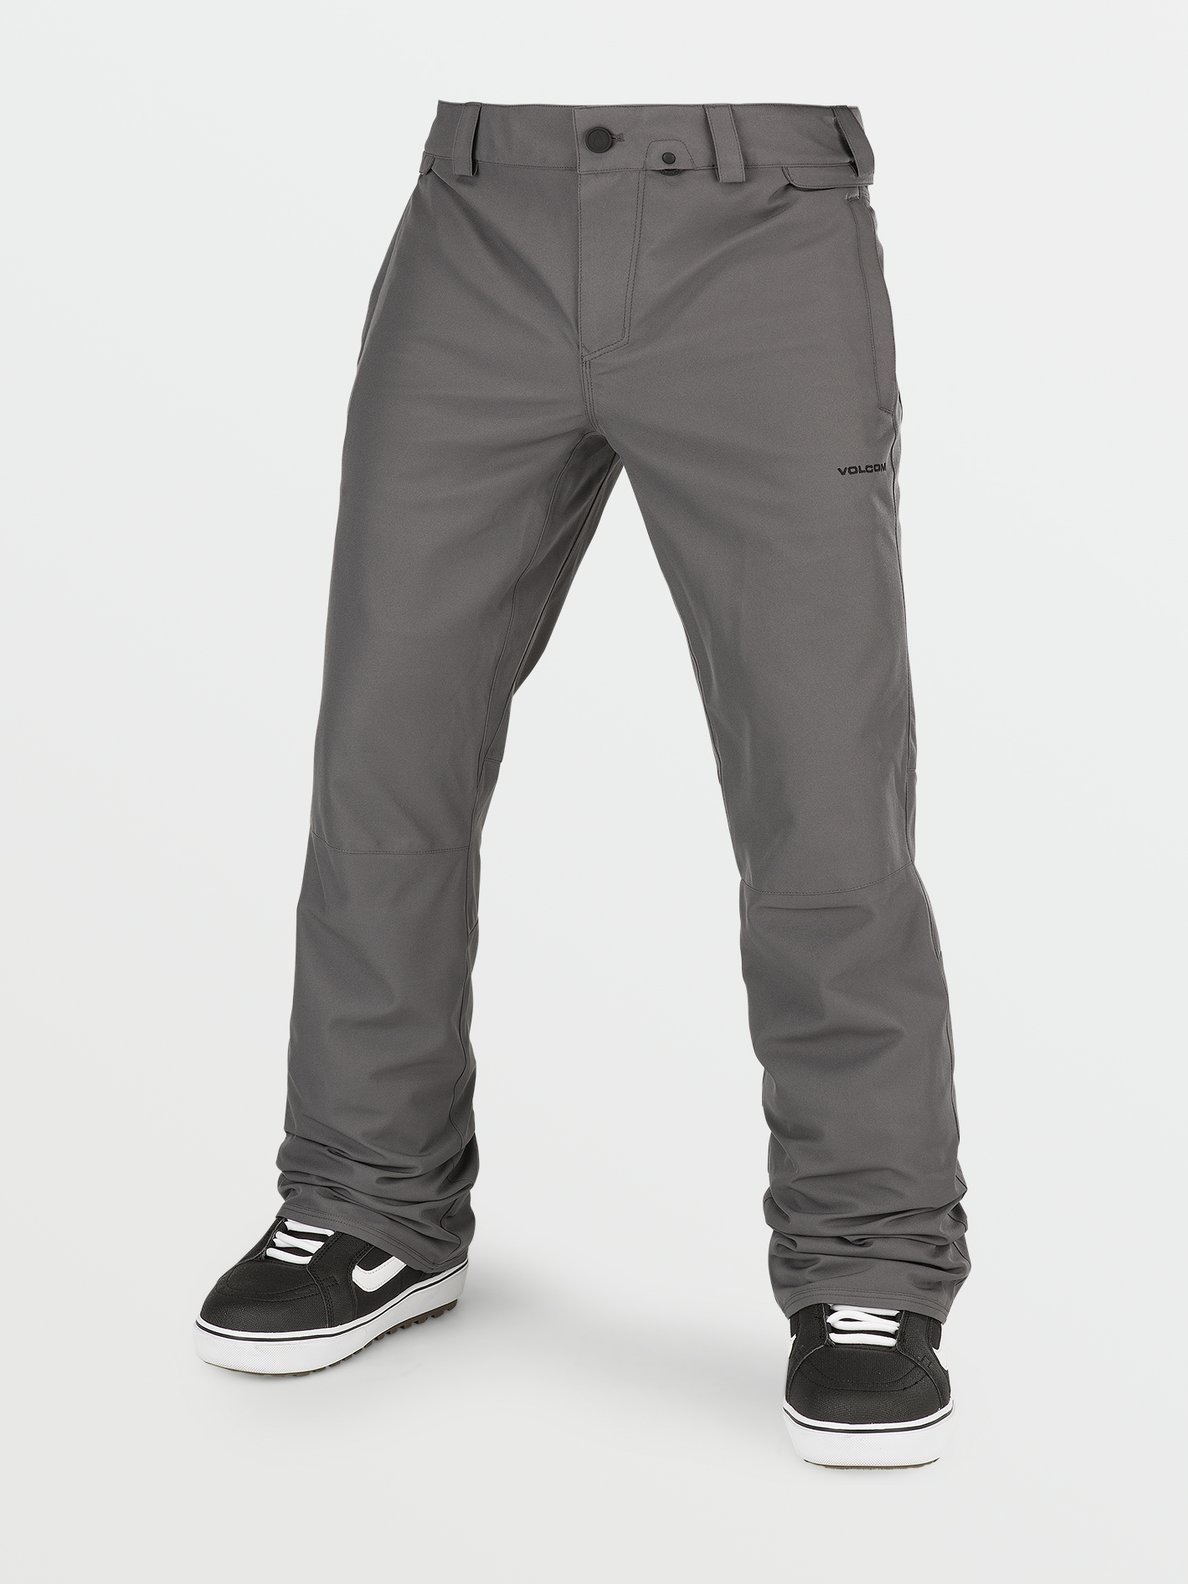 Volcom Klocker Tight Pant Grey